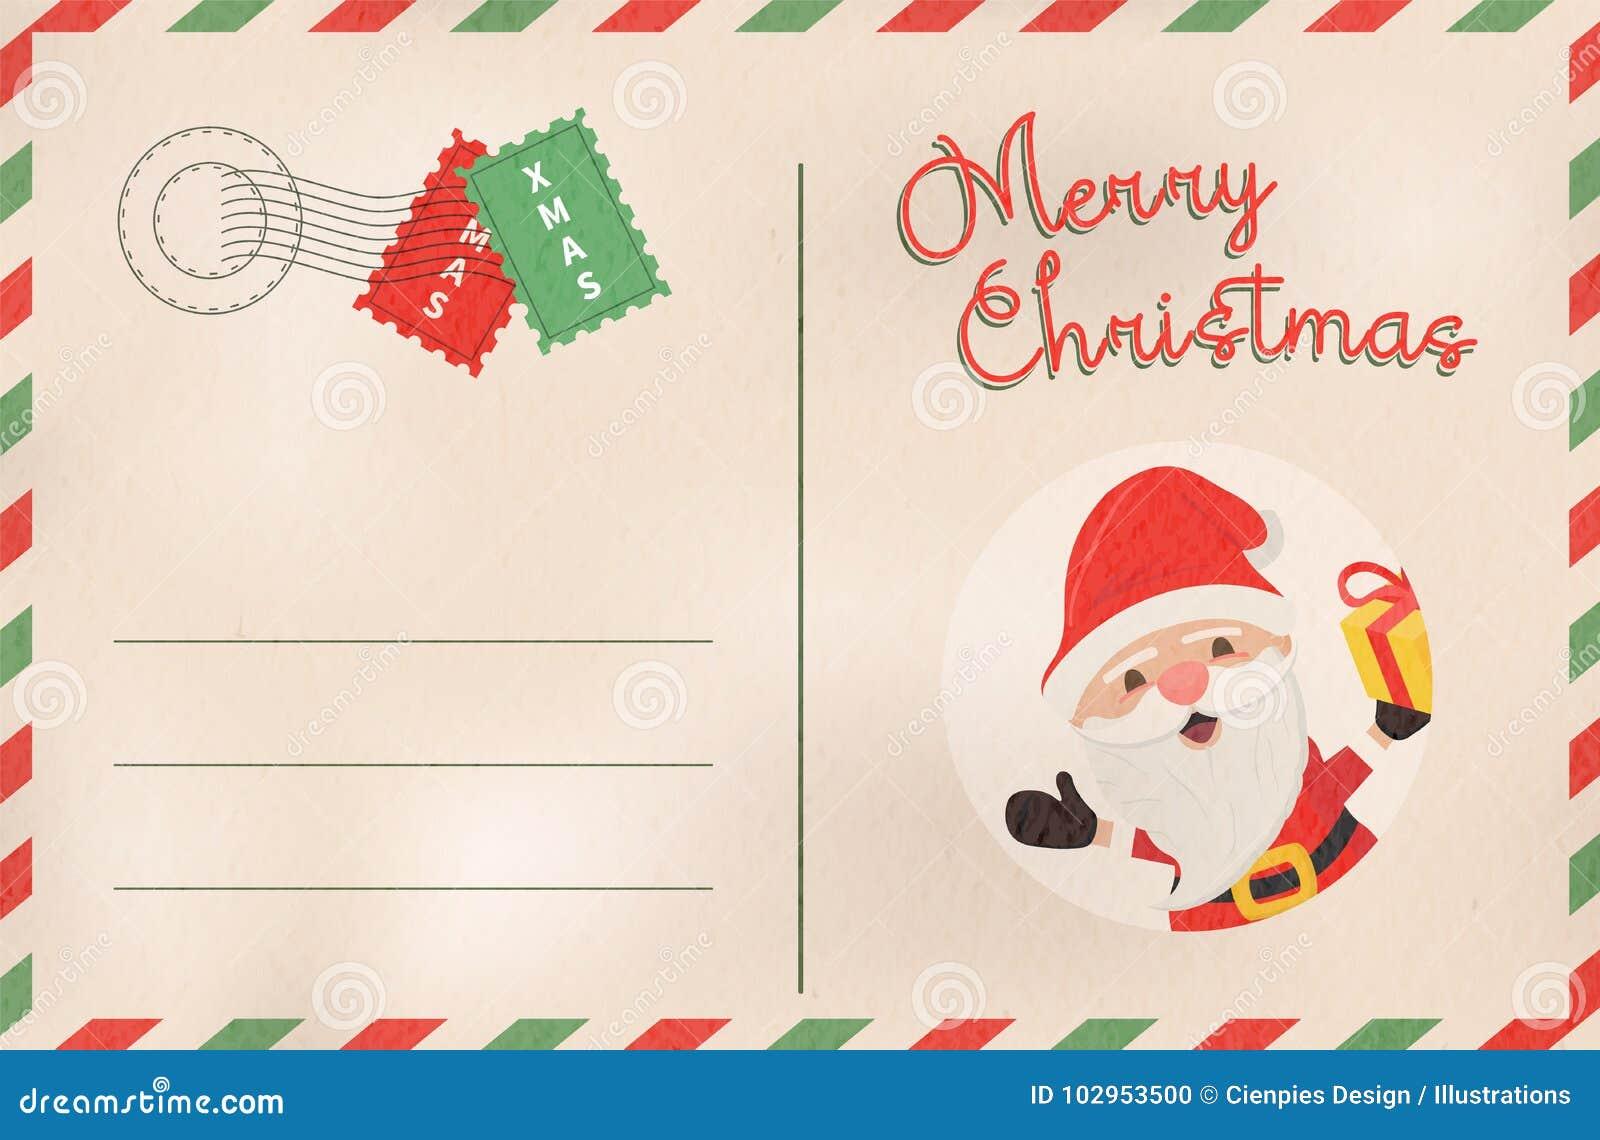 Merry Christmas Retro Santa Claus Holiday Postcard Stock Vector